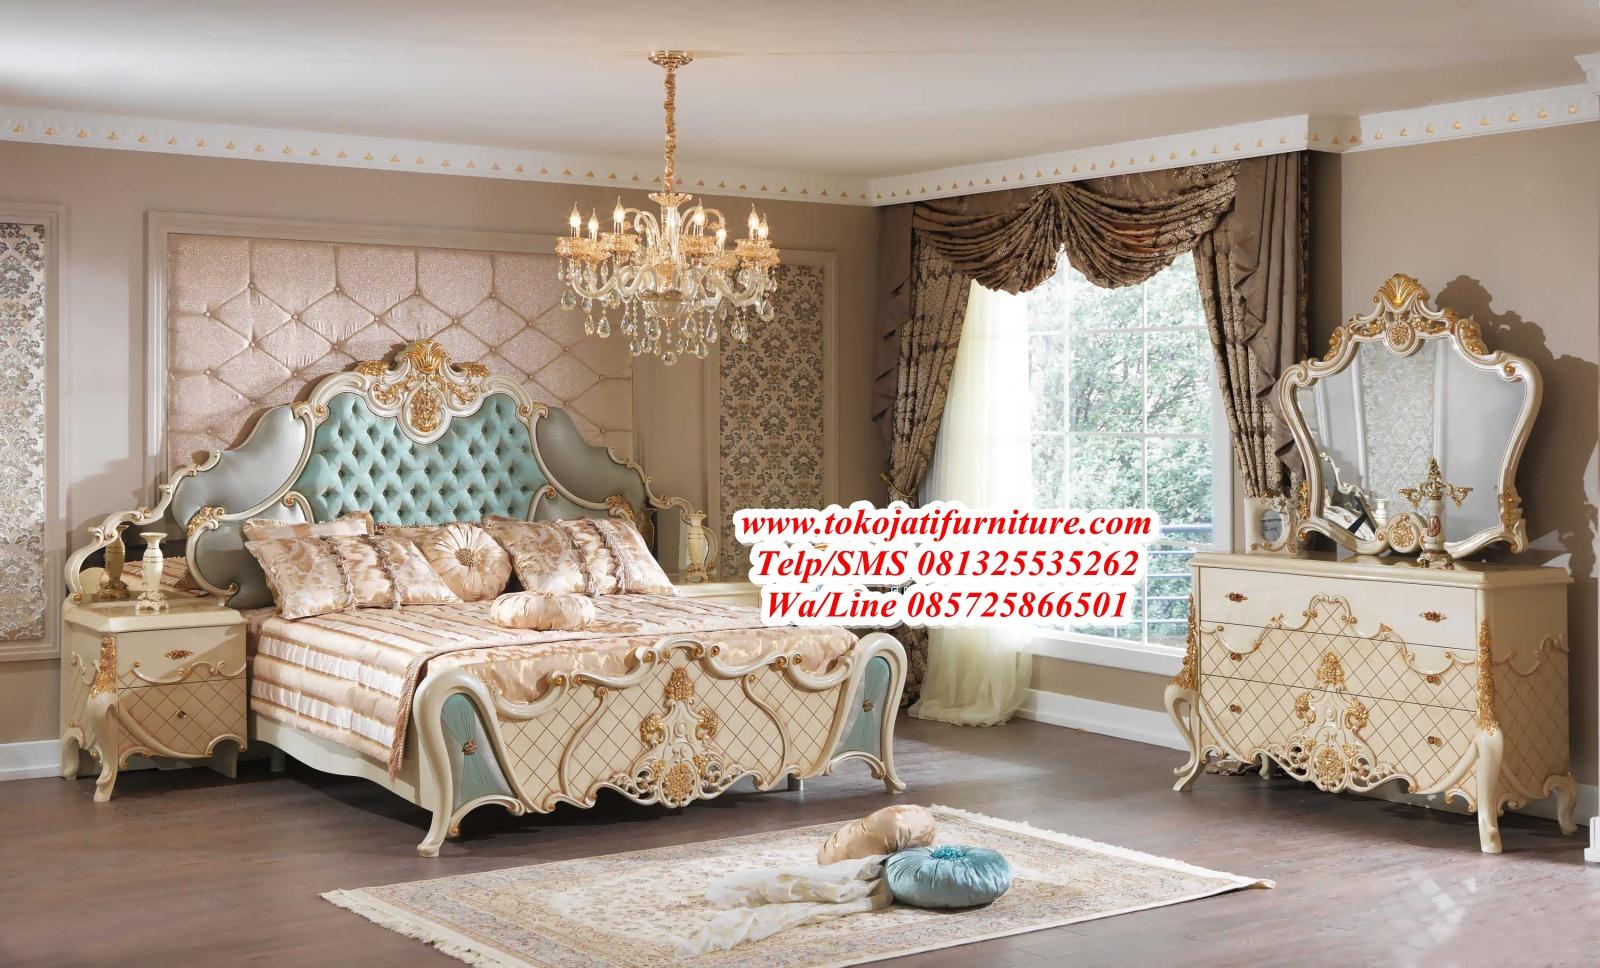 tempat-tidur-ukiran-modern-luxury tempat tidur ukiran modern luxury